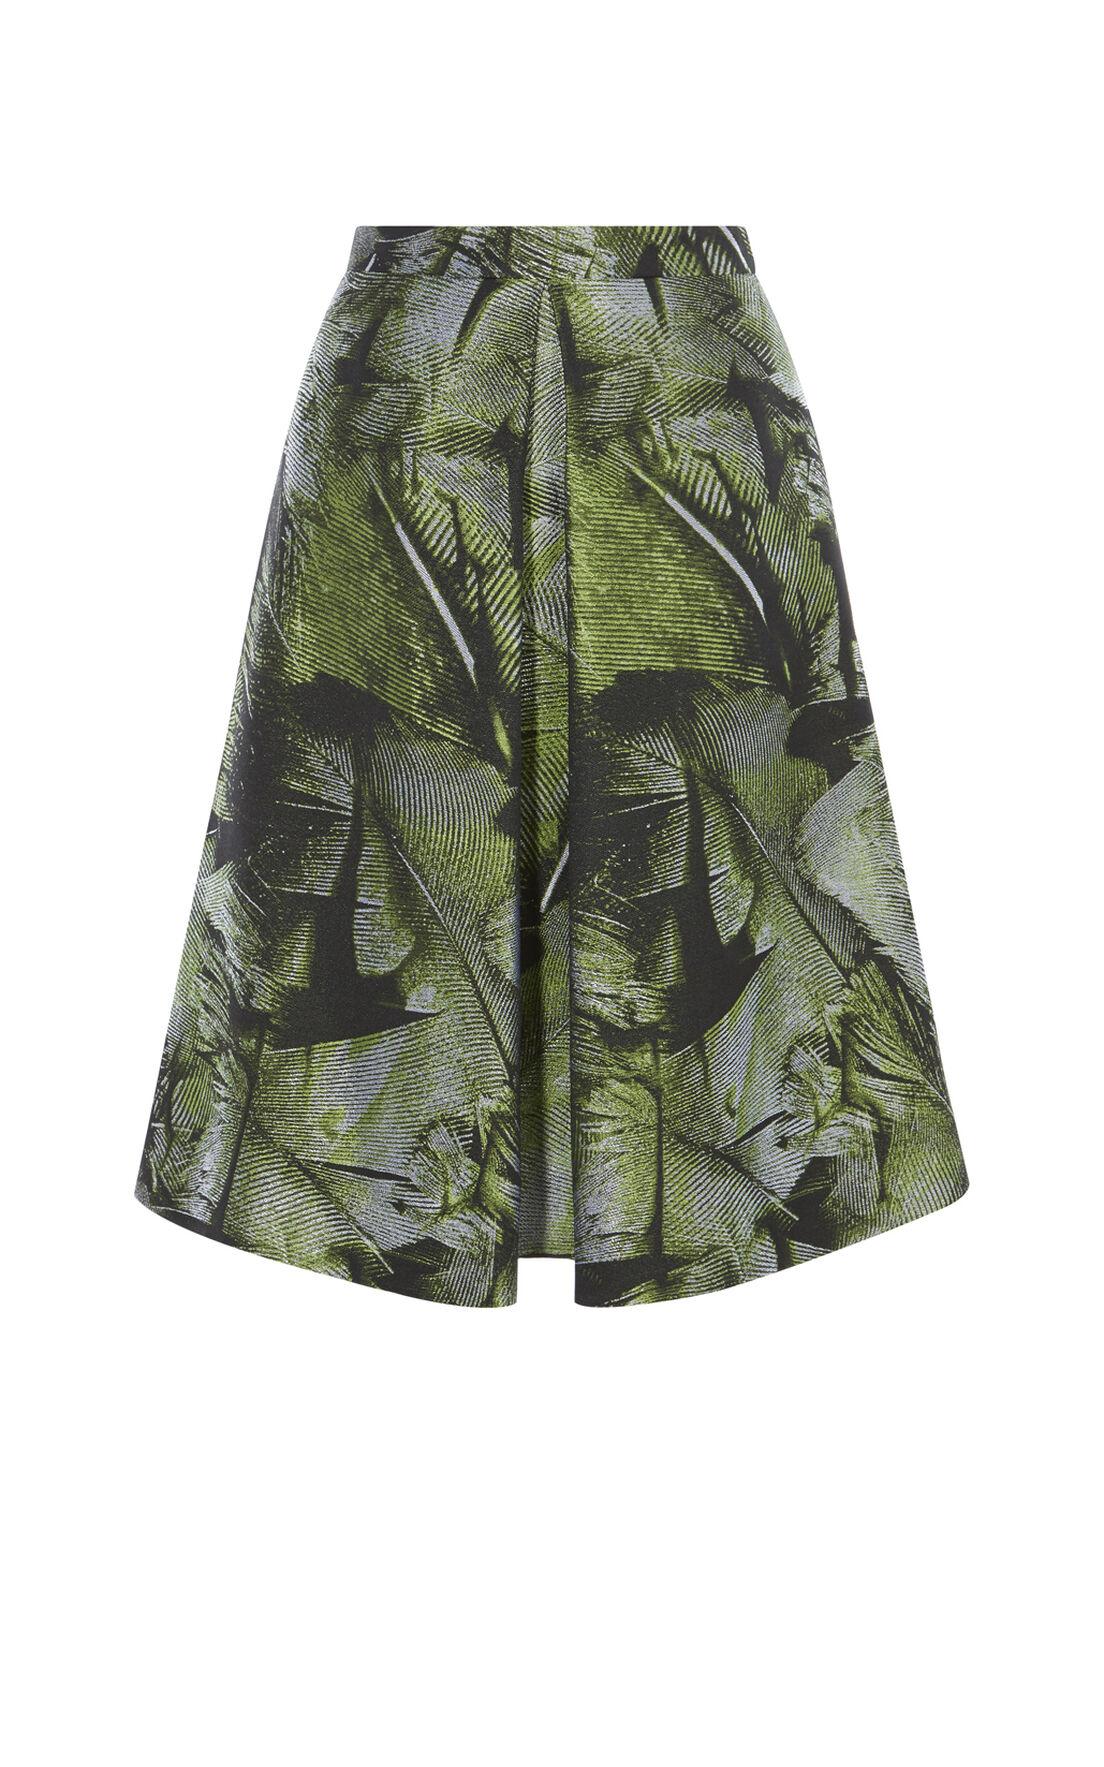 Karen Millen, PALM-LEAF JACQUARD SKIRT Green/Multi 0